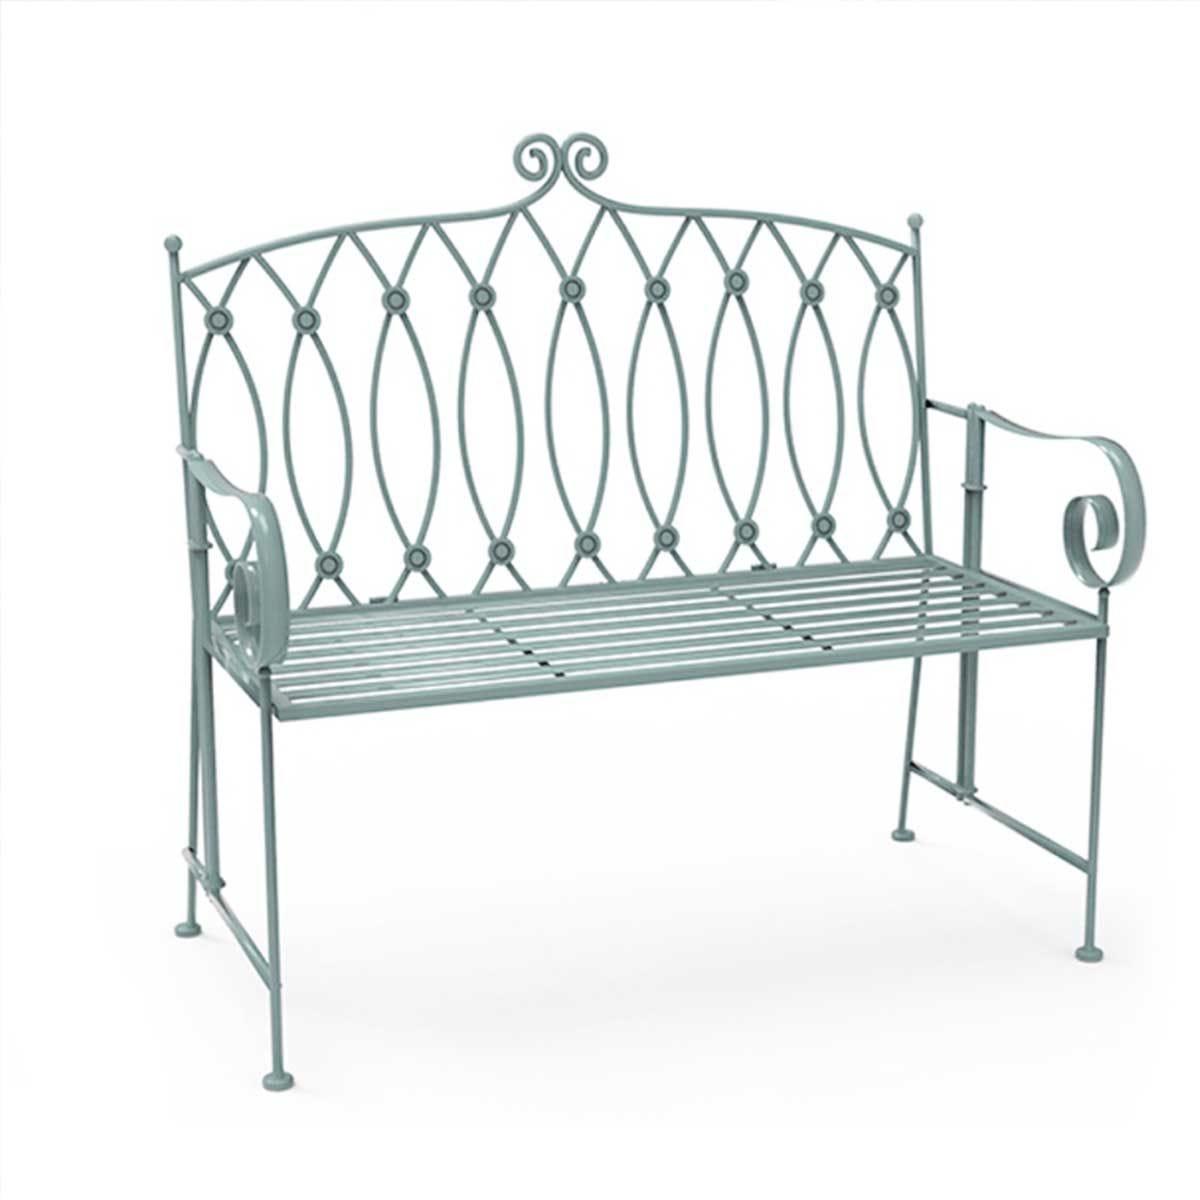 Charles Bentley Wrought Iron Bench - Sage Green